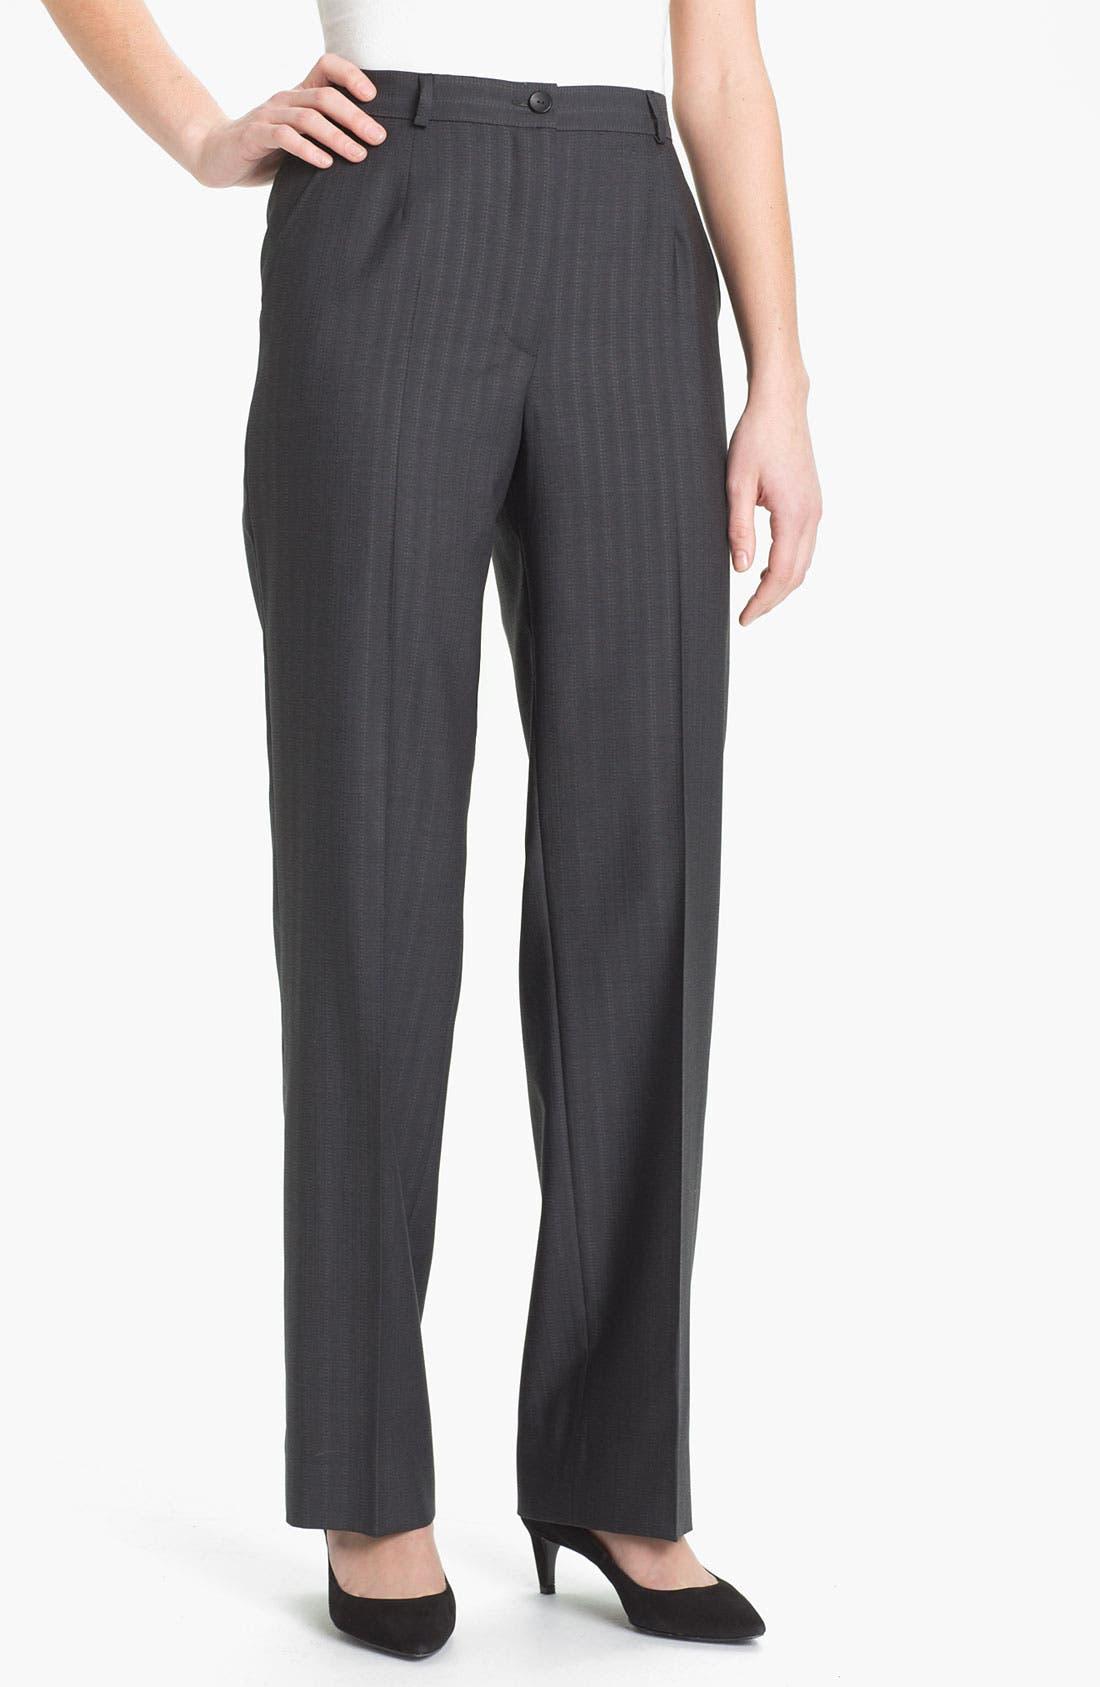 Alternate Image 1 Selected - Zanella 'Goldie' Tonal Stripe Wool Pants